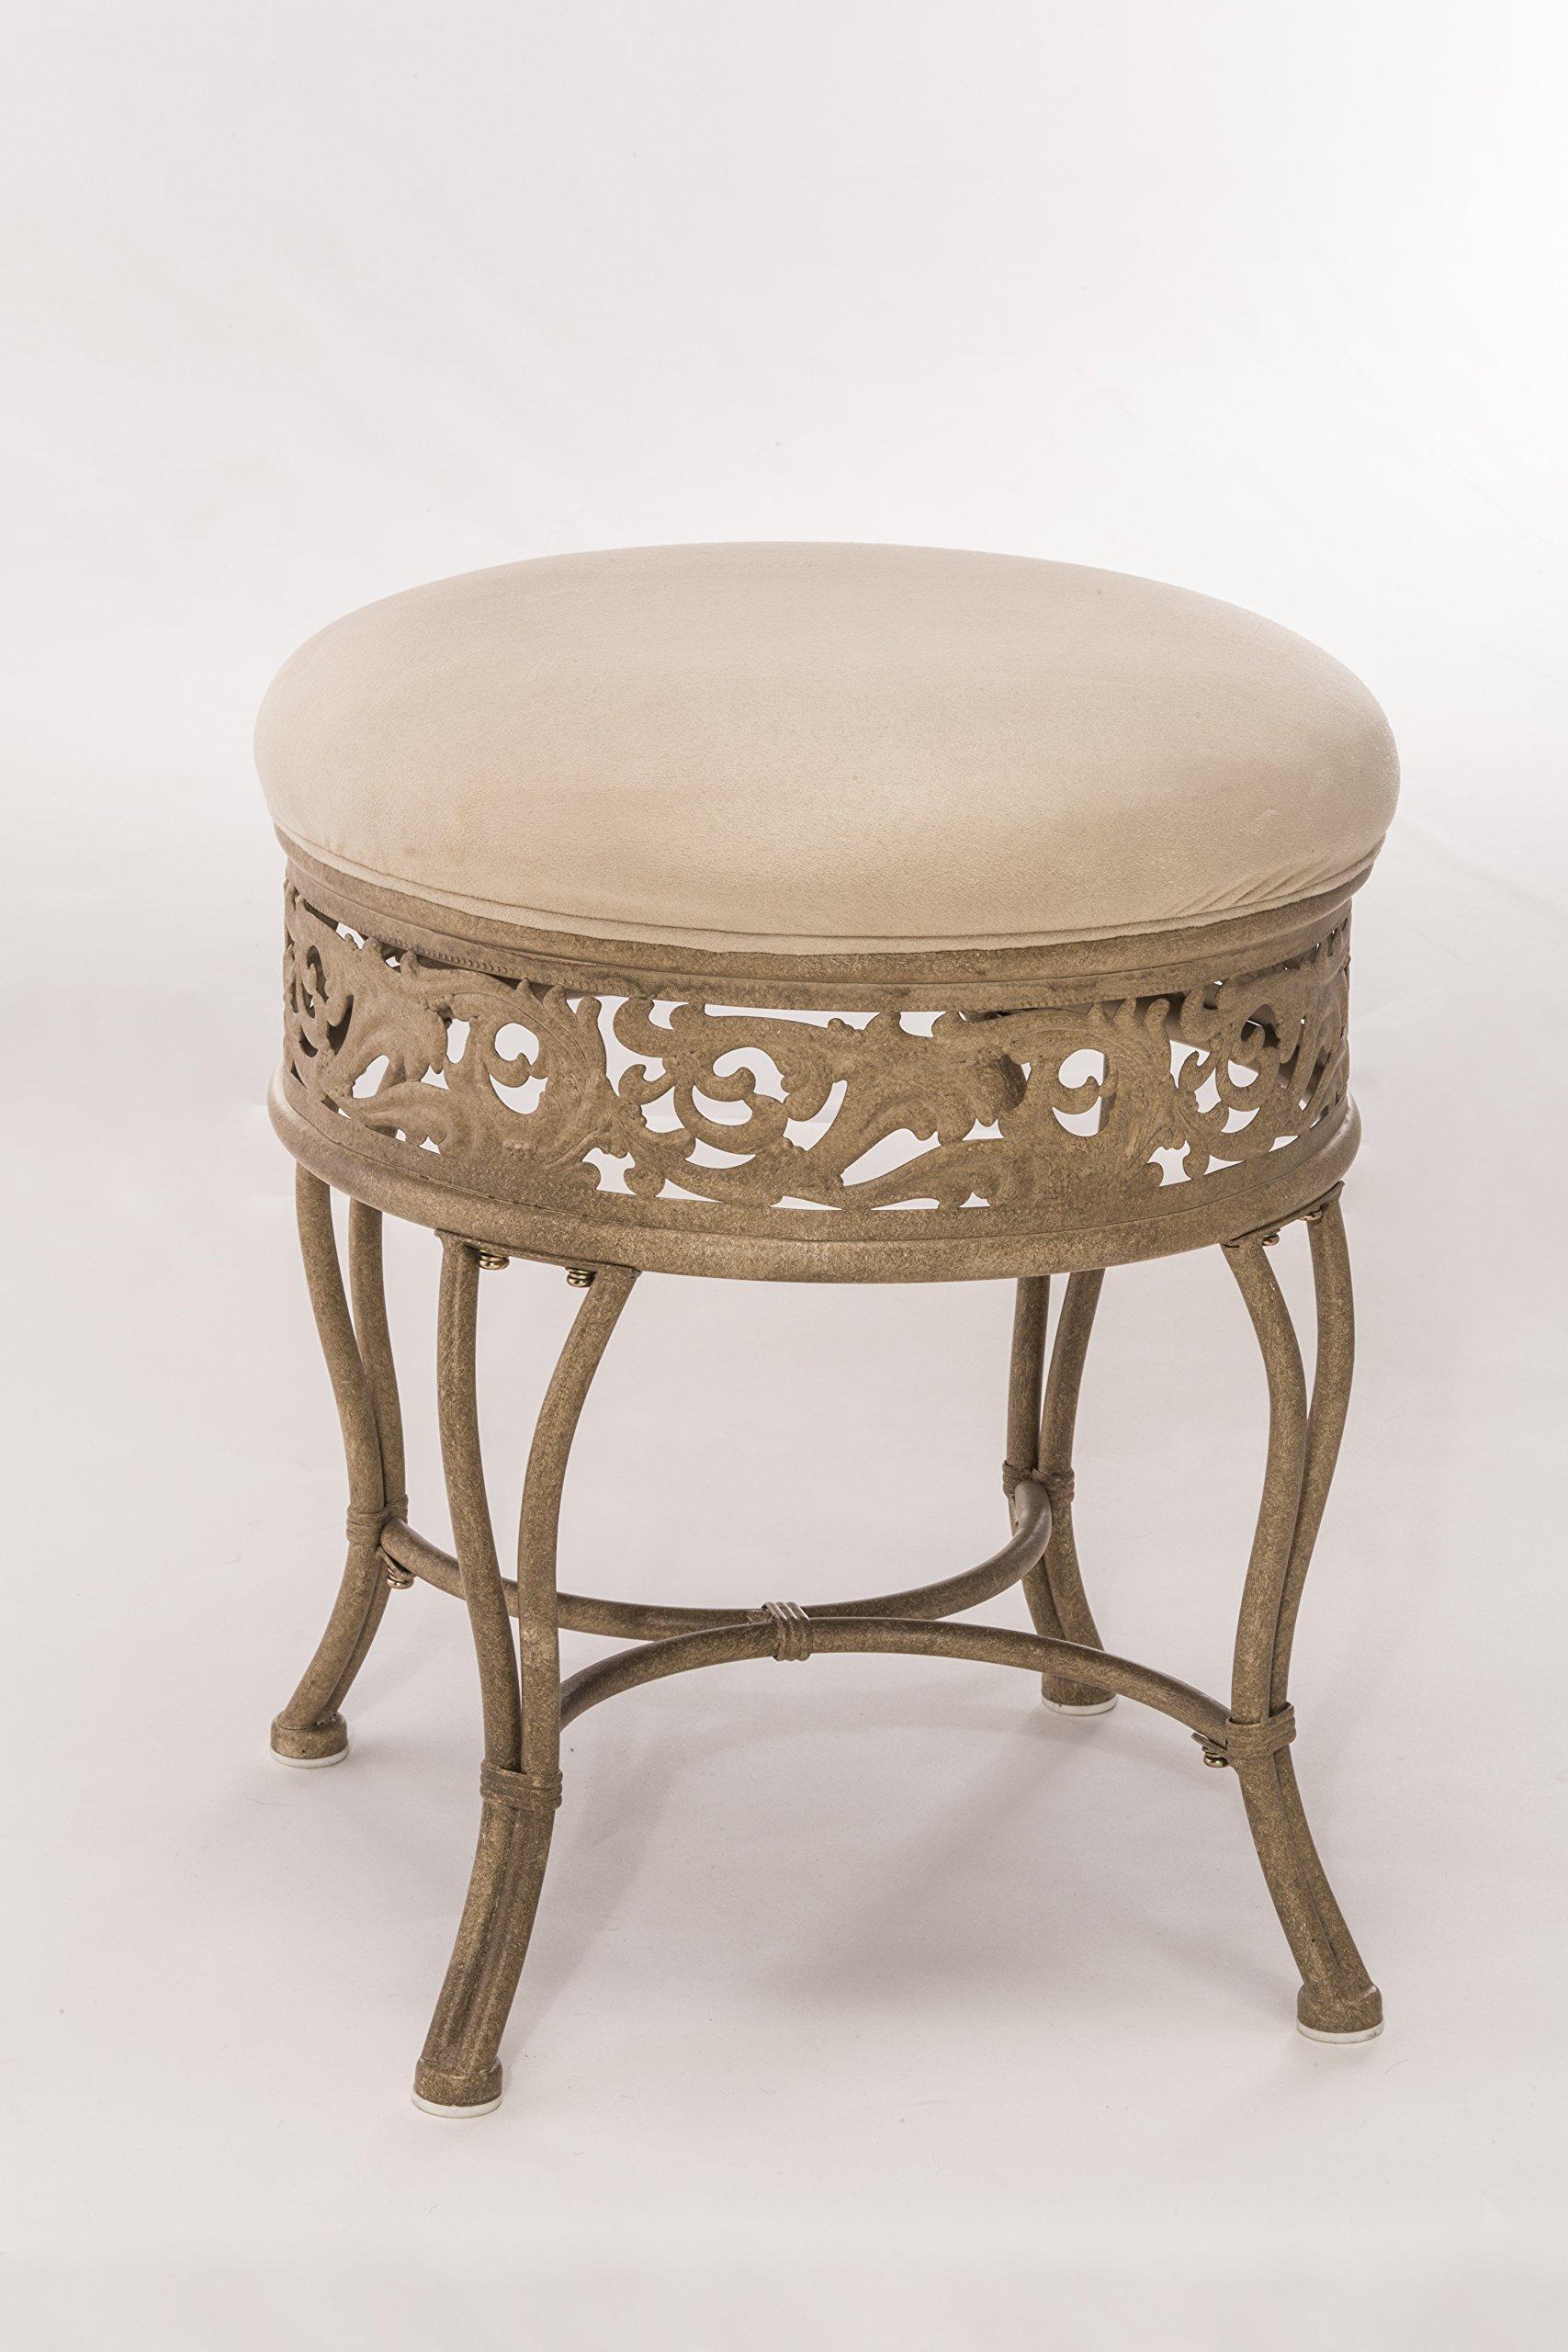 Hillsdale Furniture Villa III Upholstered Backless Vanity Stool, Antique Beige